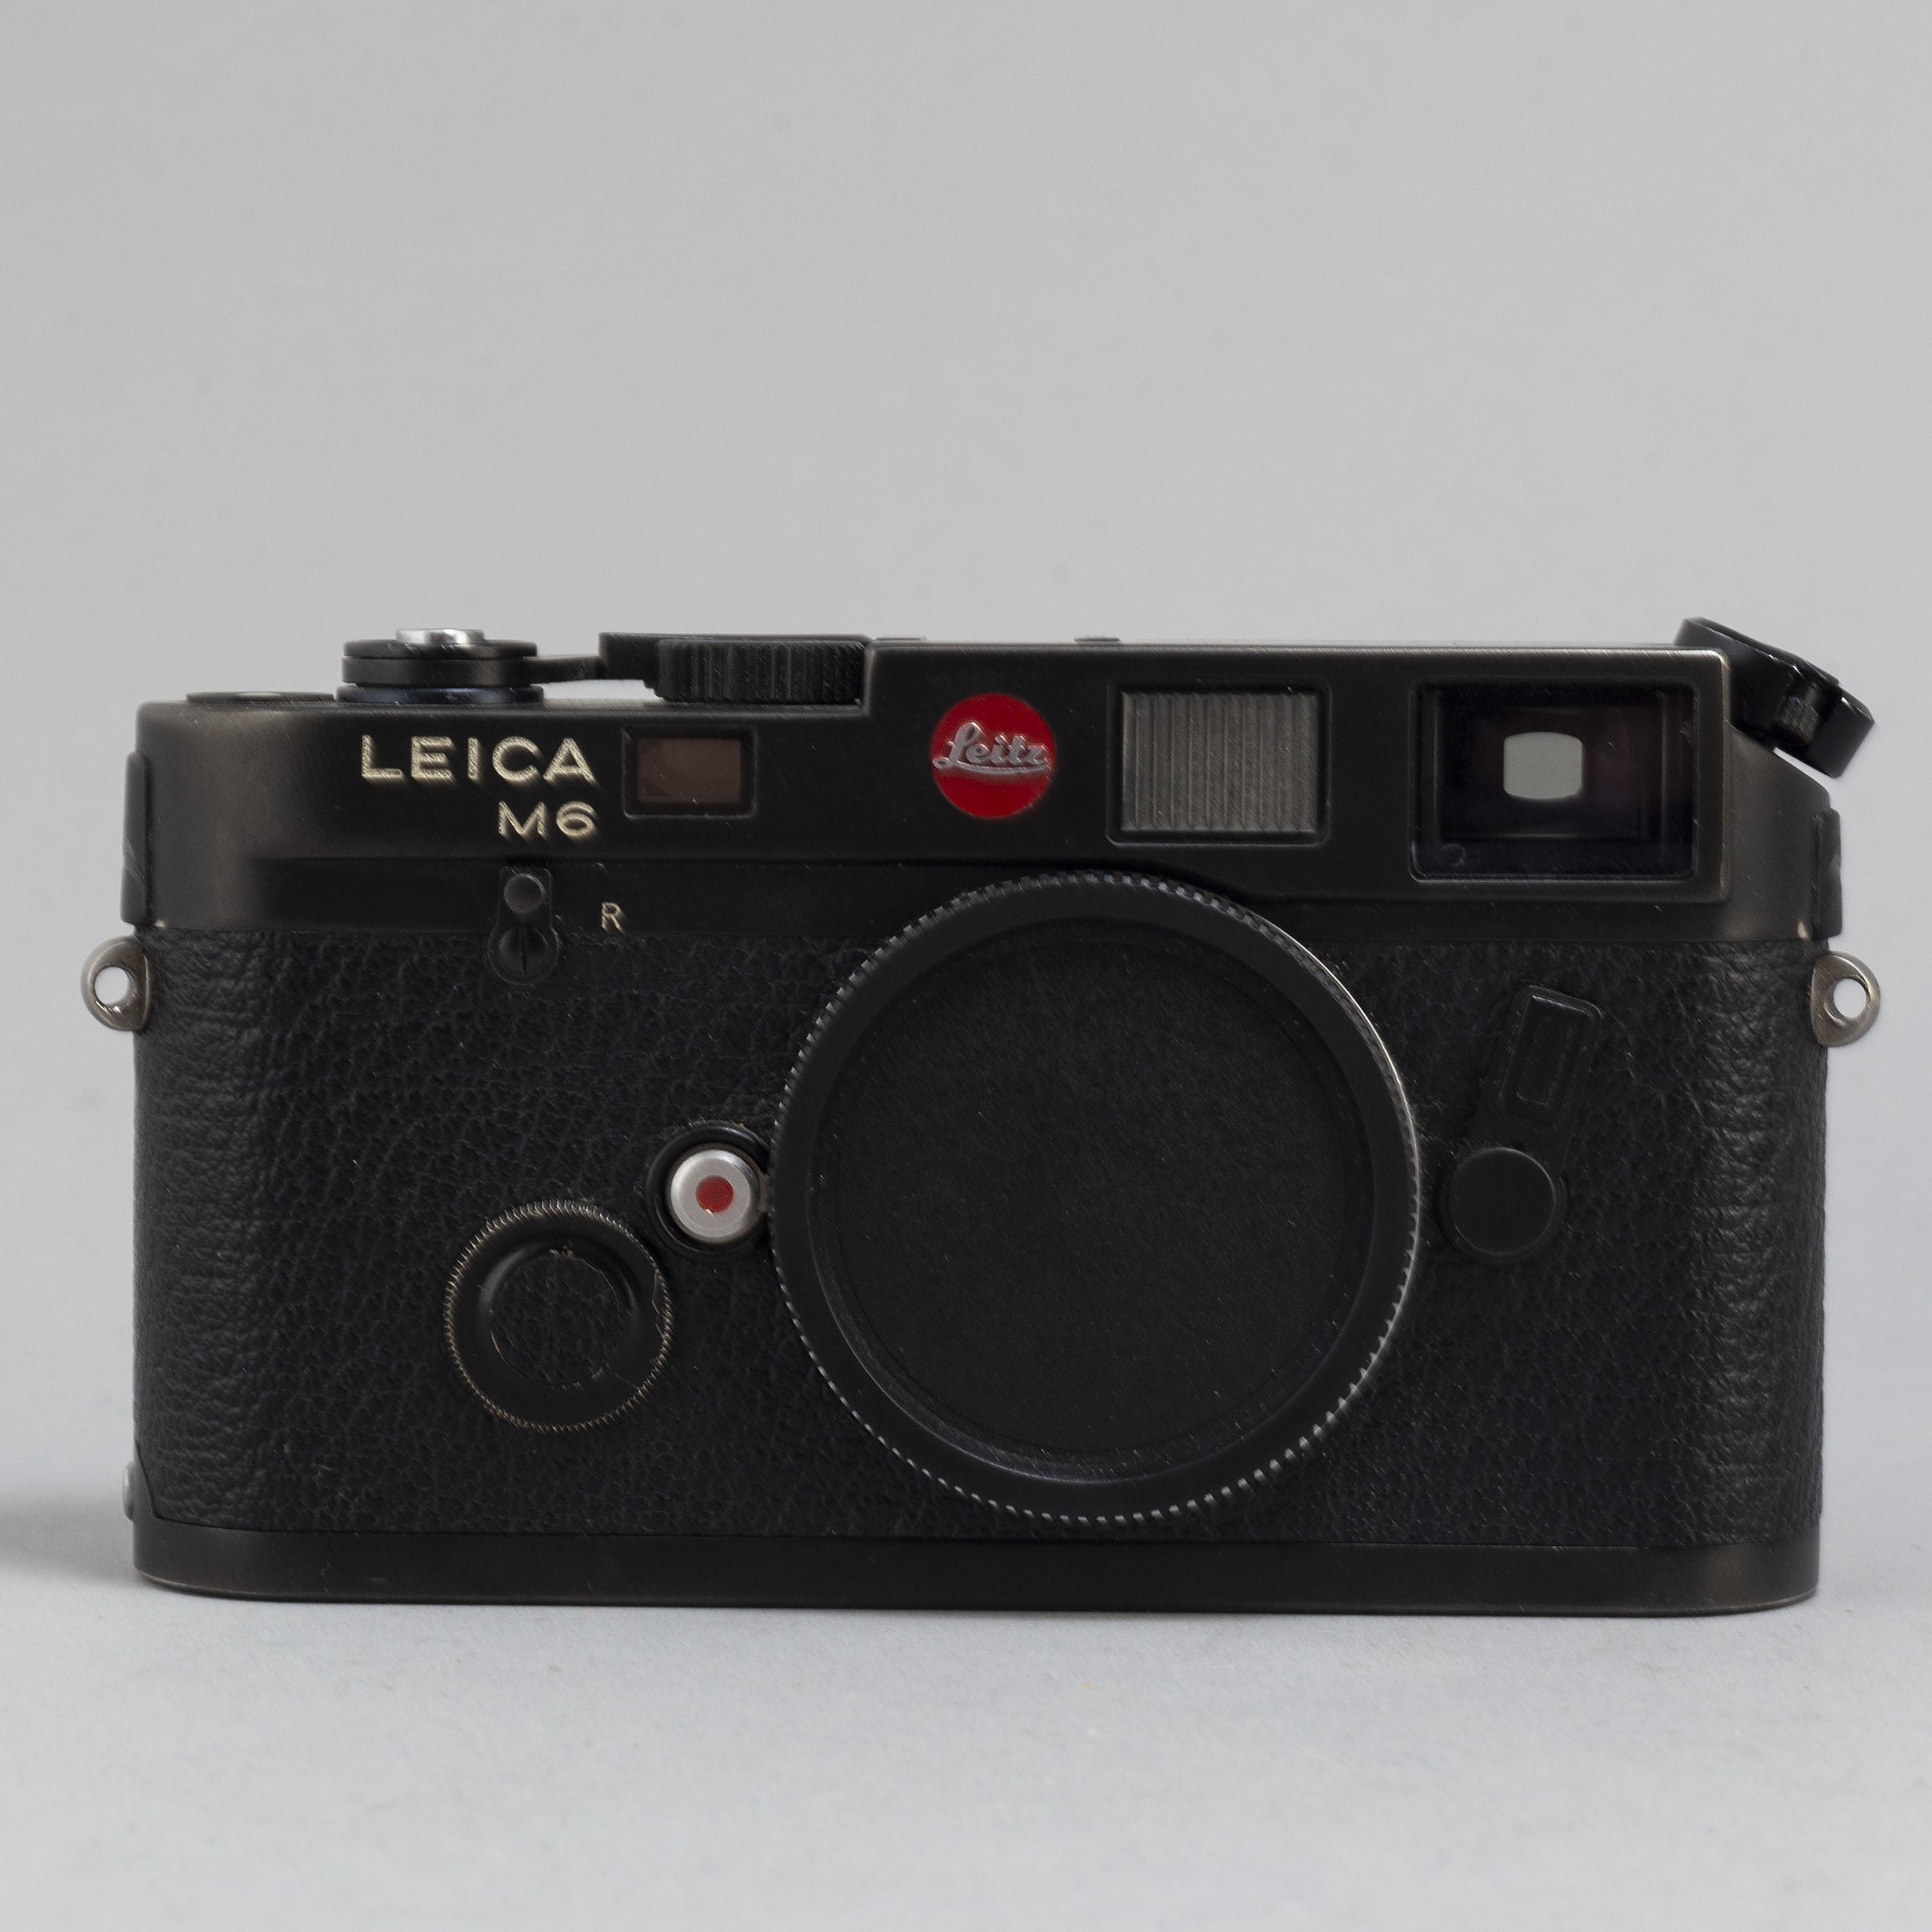 561be8ea7db1 A Leica M6 body with a Summilux 1:1.4/50. - Bukowskis